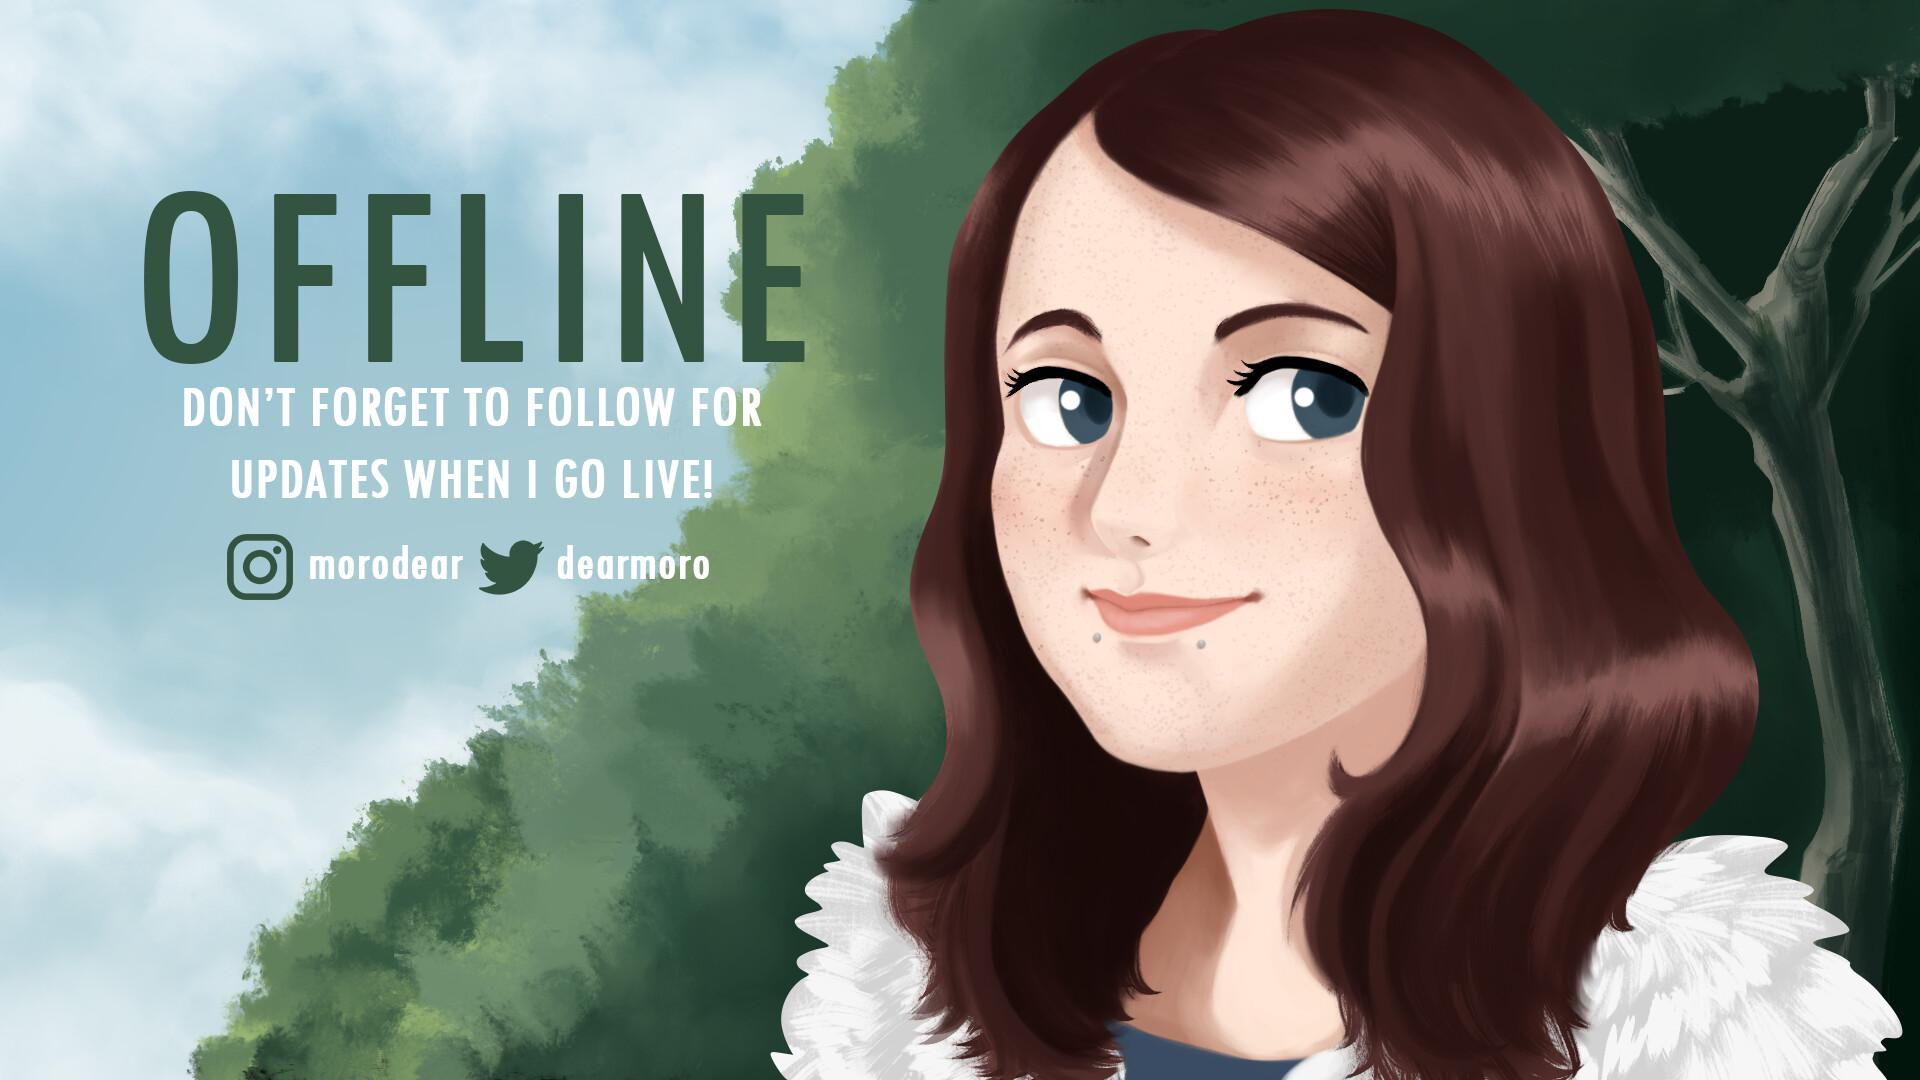 Offline Graphic